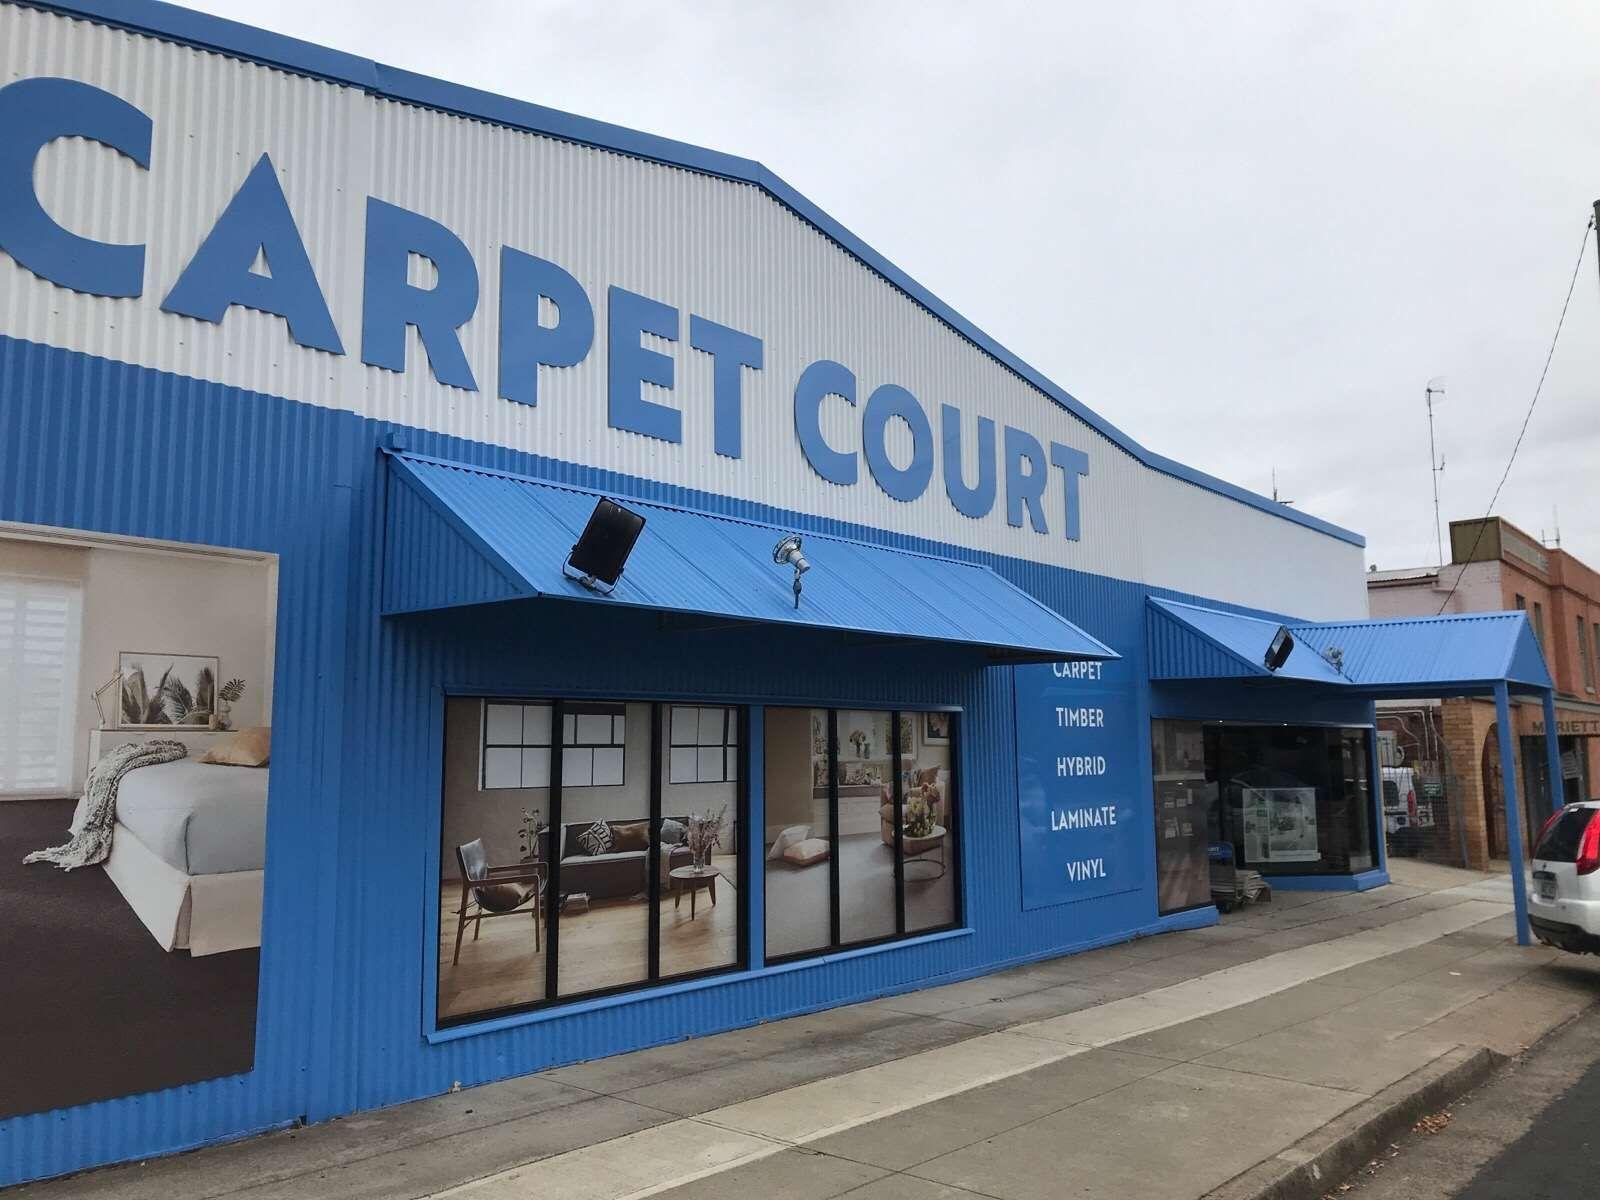 Bathurst Carpet Court